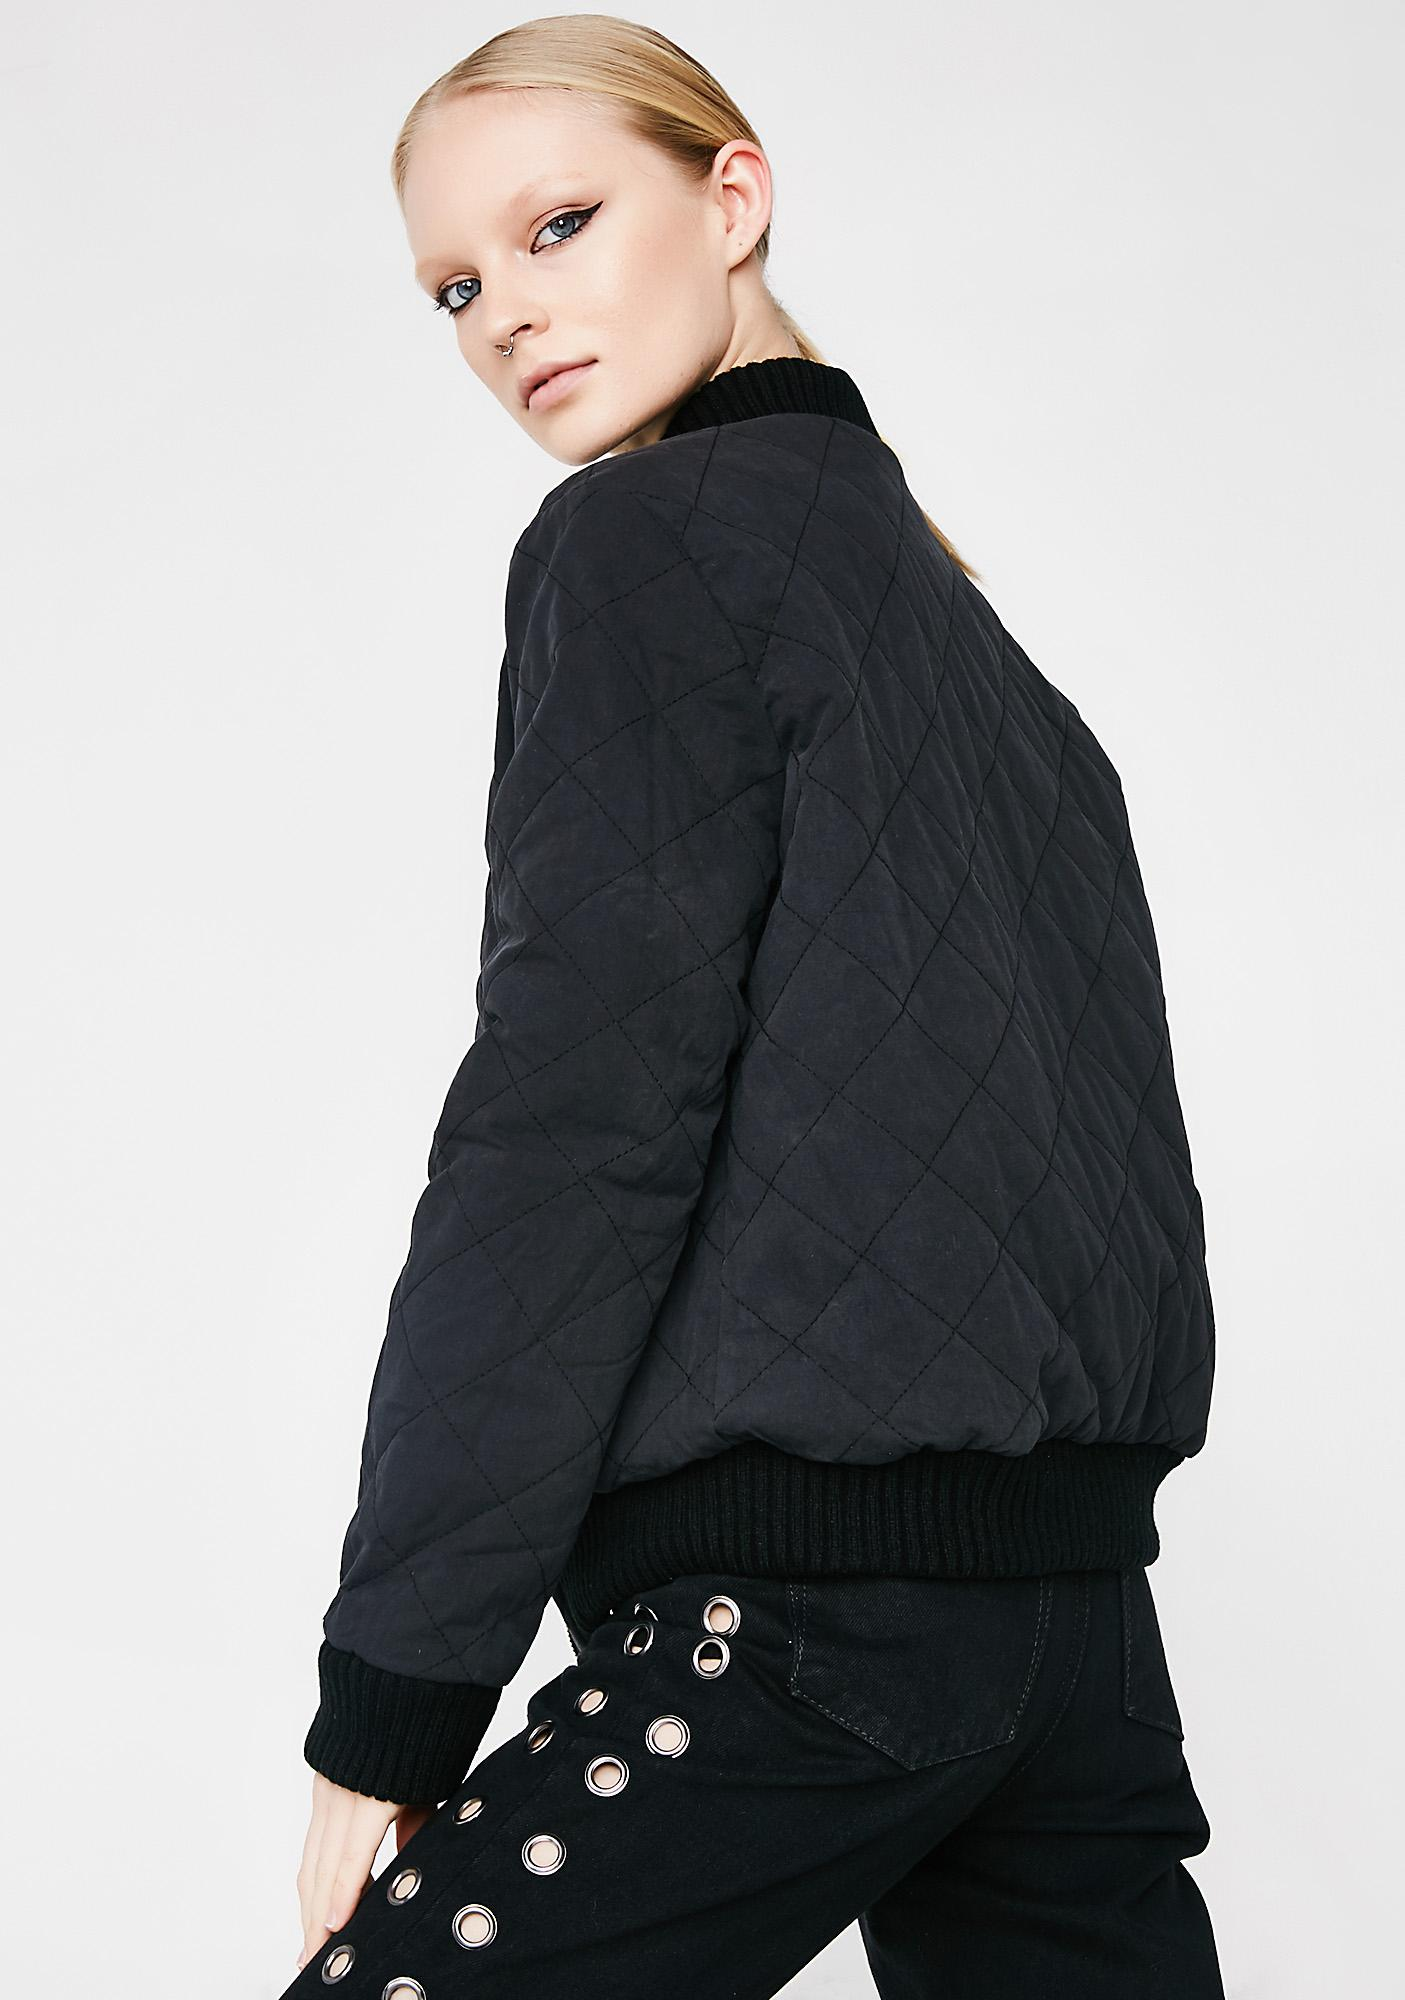 Lira Clothing Benson Reversible Bomber